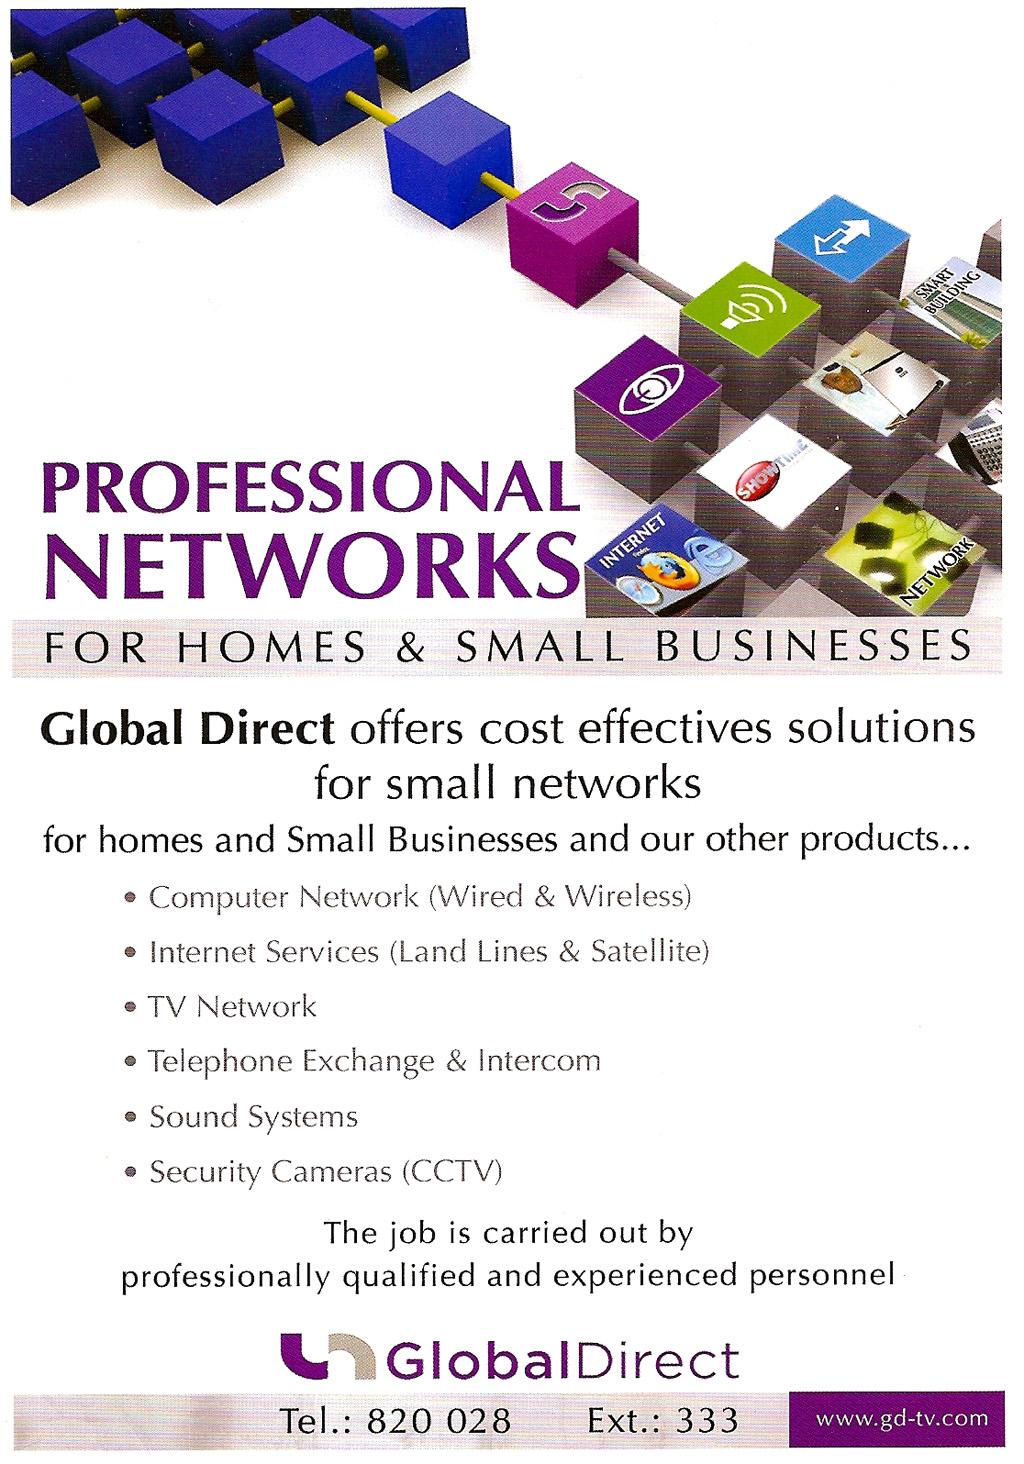 Global Direct Professional Networks - شبكات جلوبال دايركت التخصصية